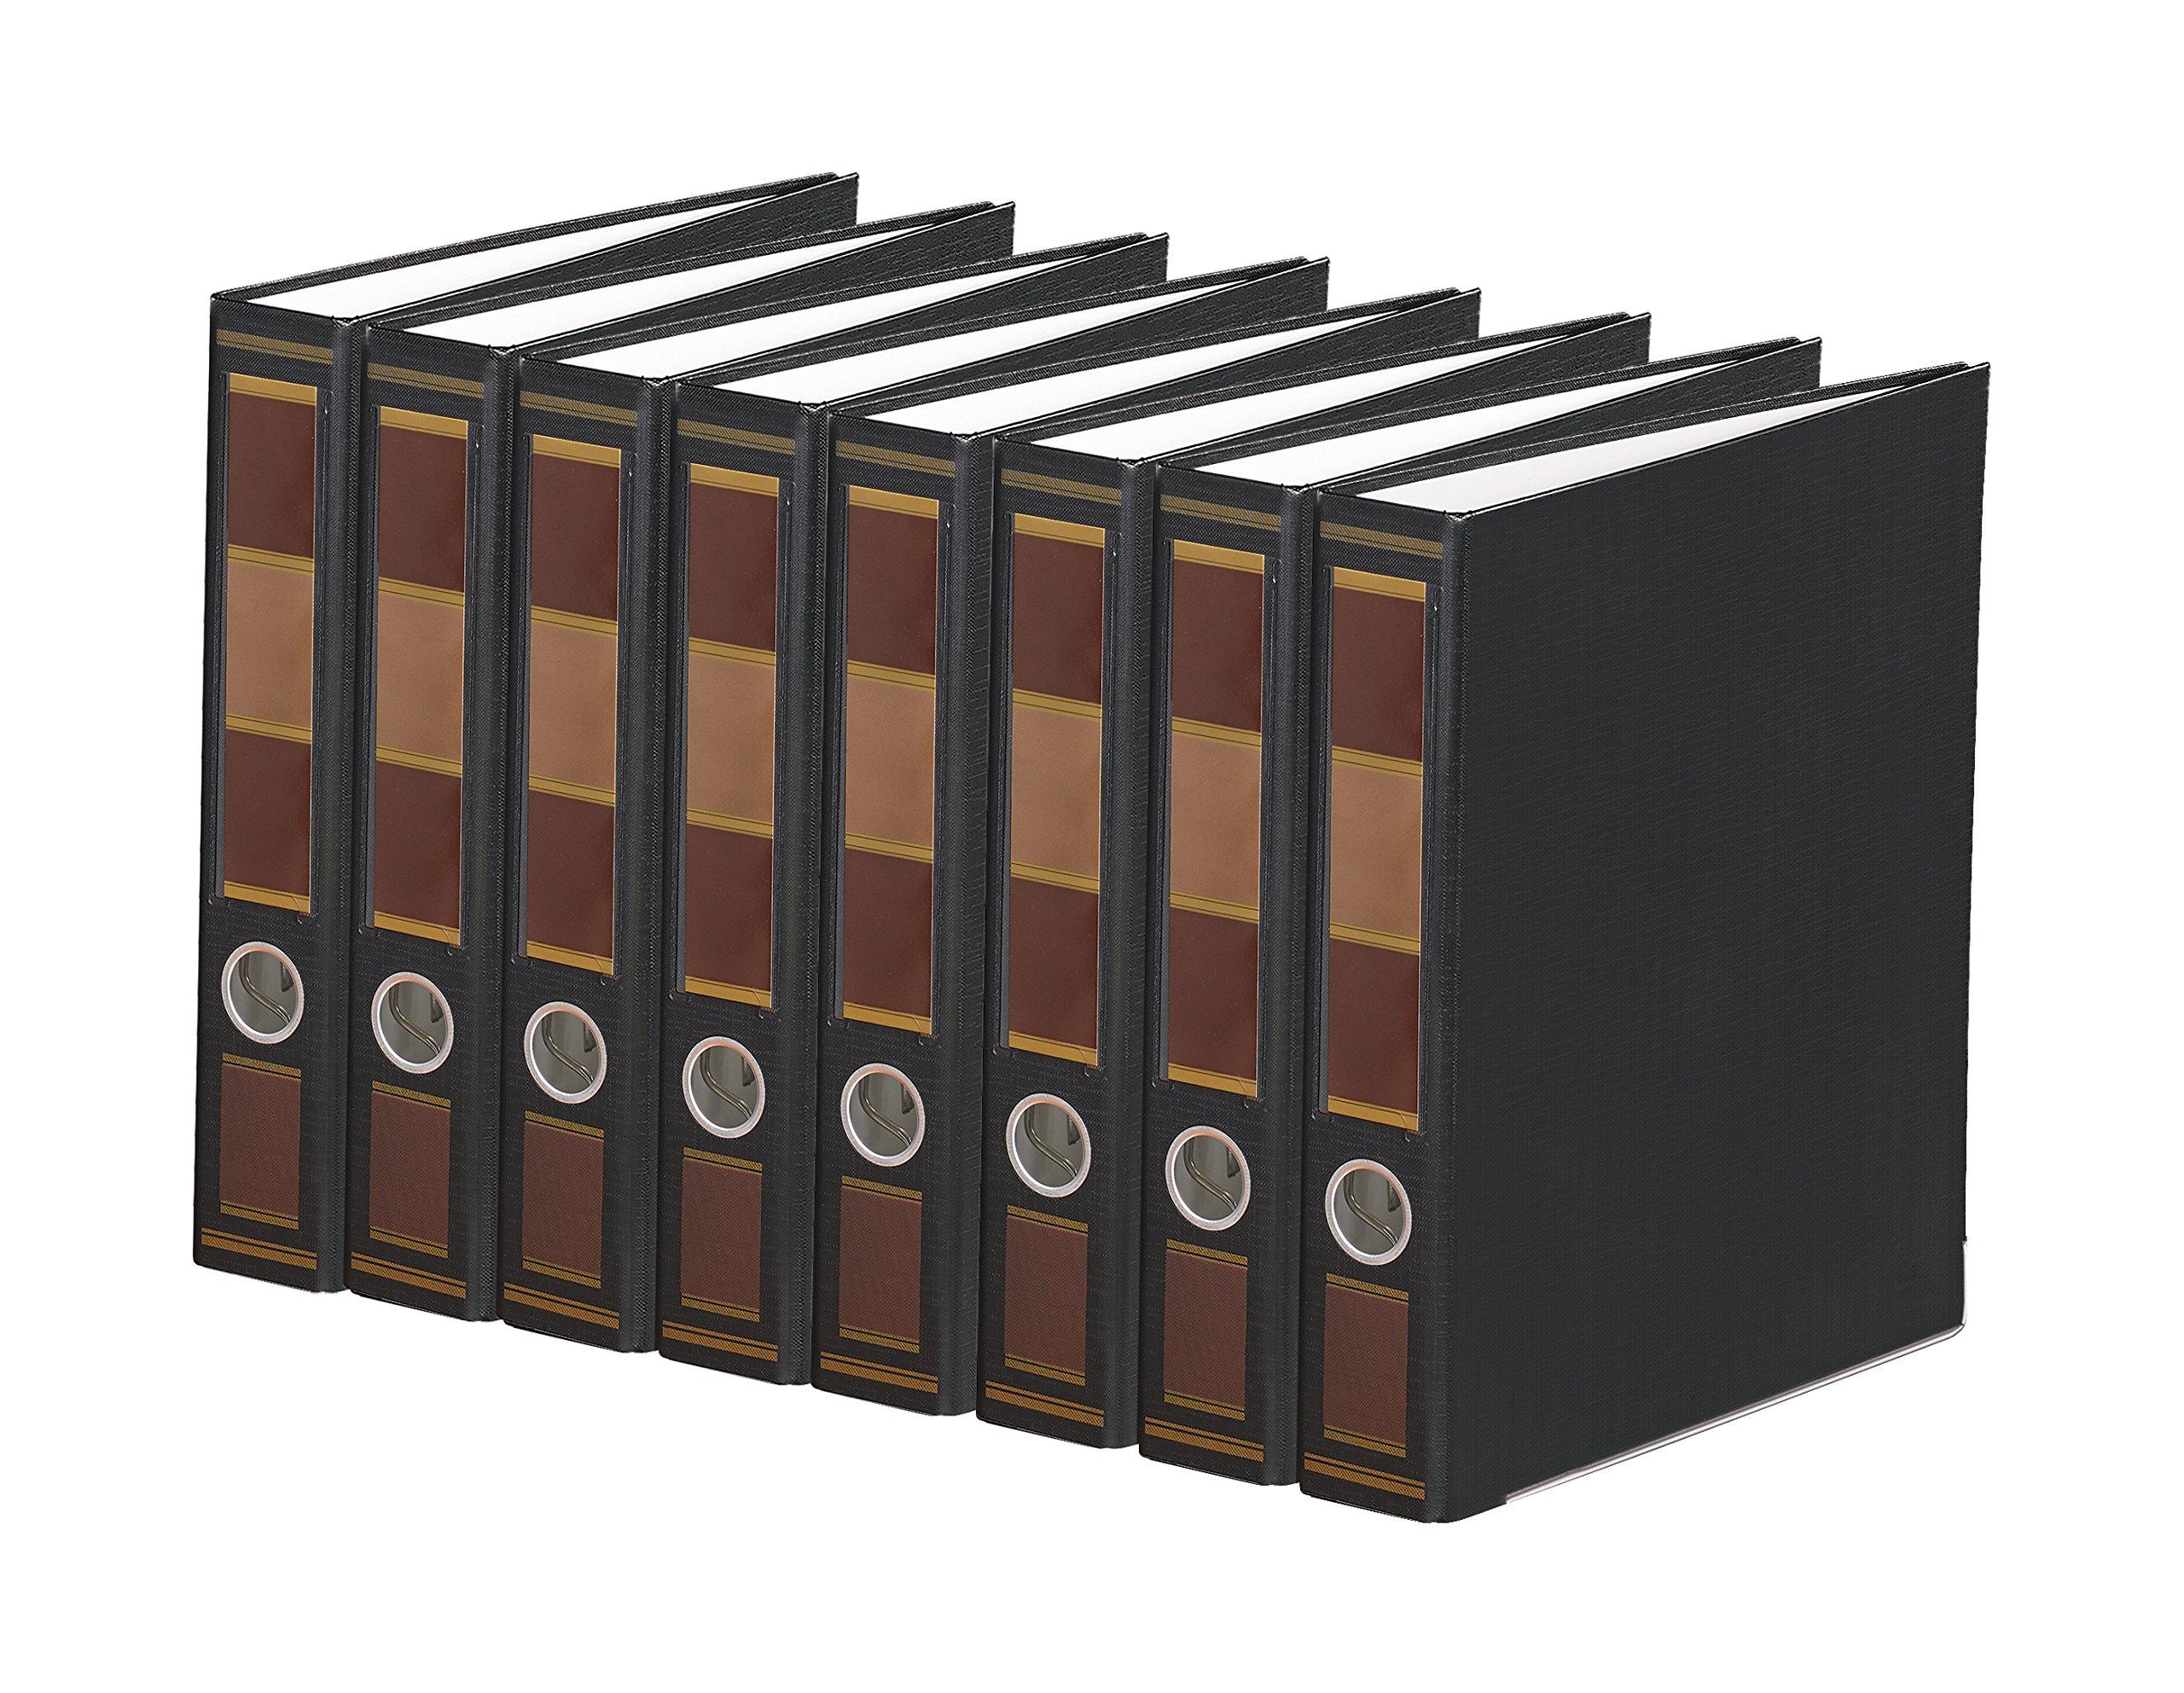 Bindertek 3-Ring 2-Inch Premium Binder 7-Pack, Barrister Black